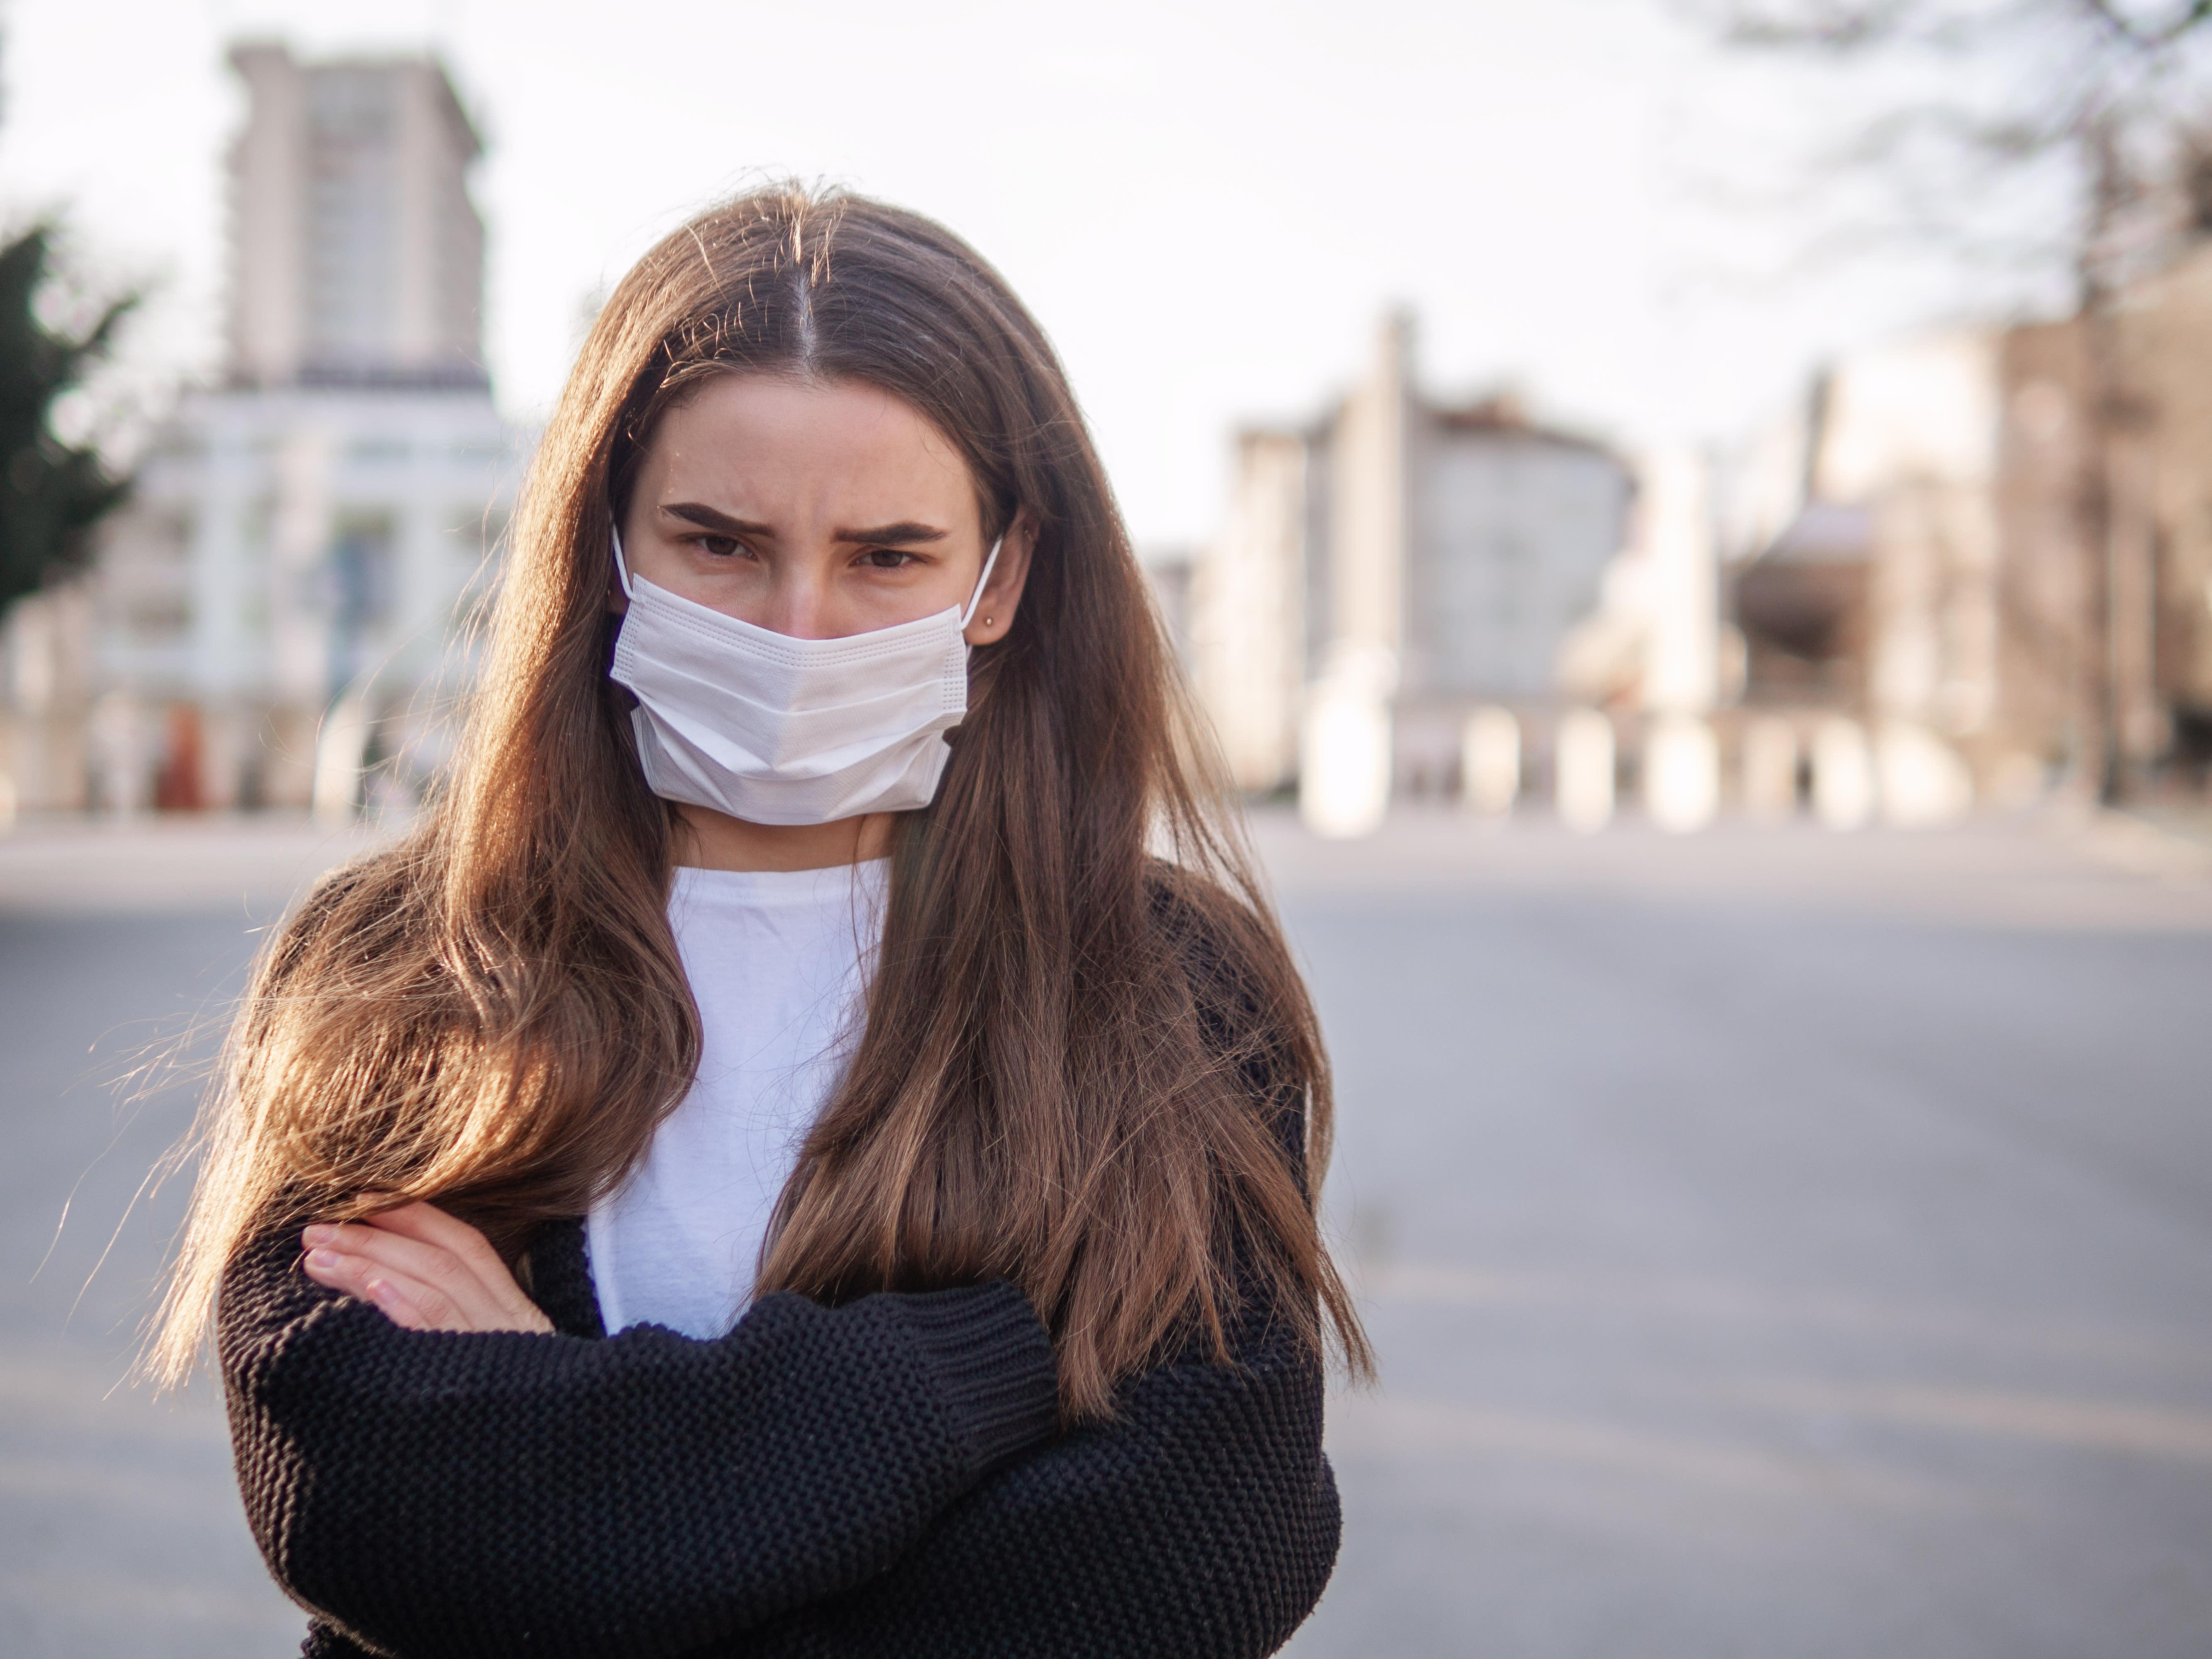 Coronavirus anxiety 'is fuelling anger'